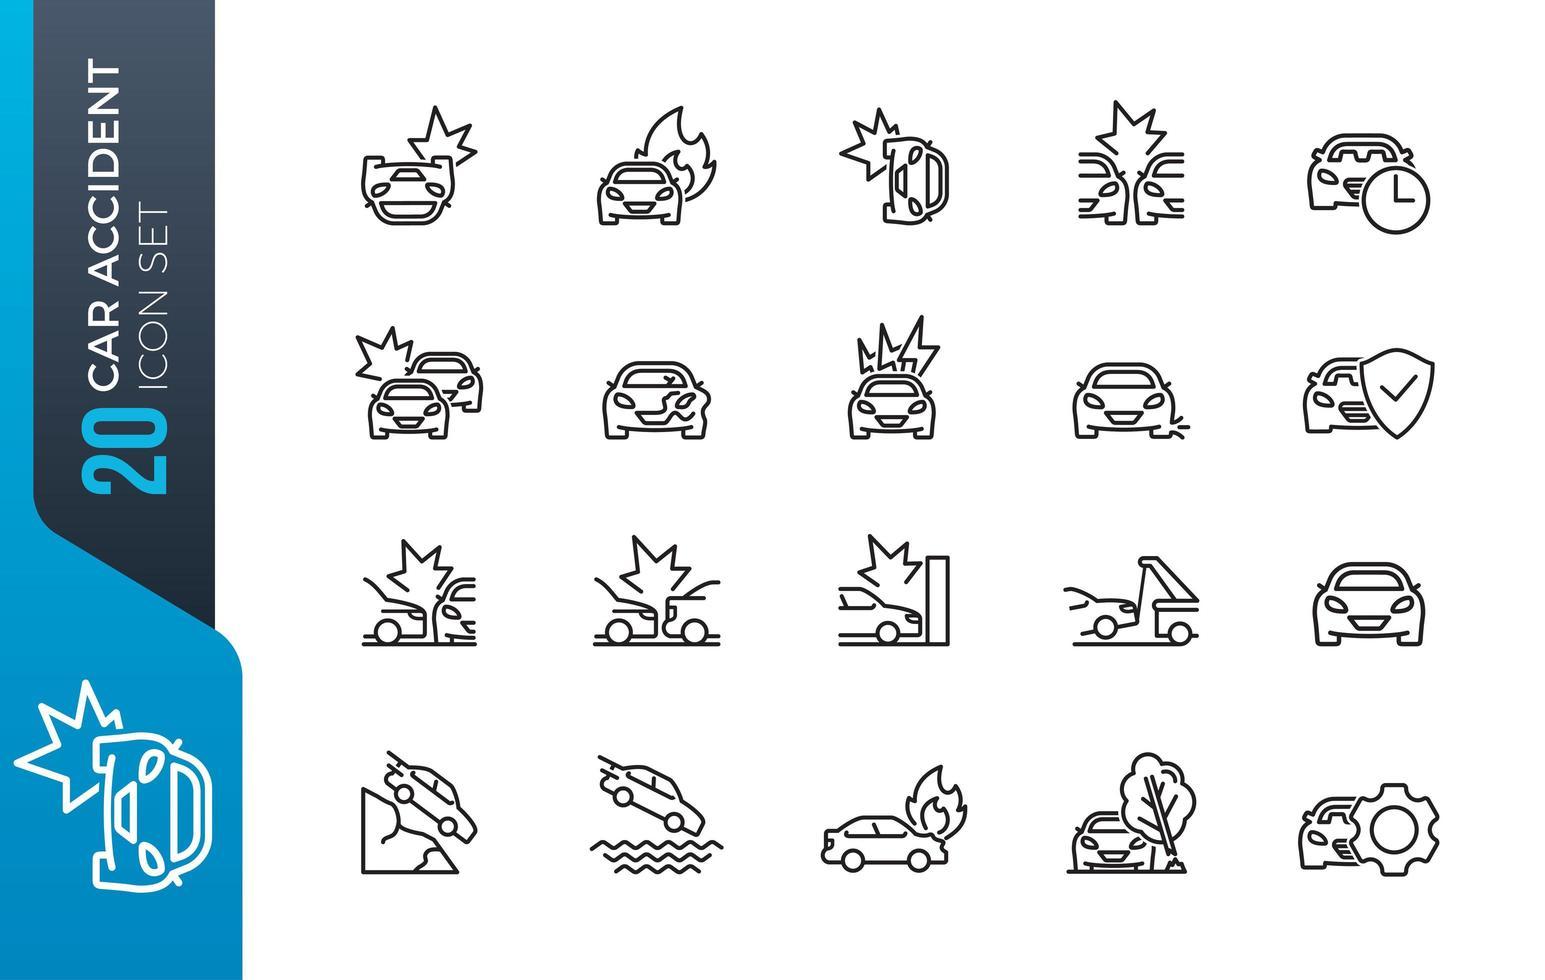 auto-ongeluk pictogramserie vector